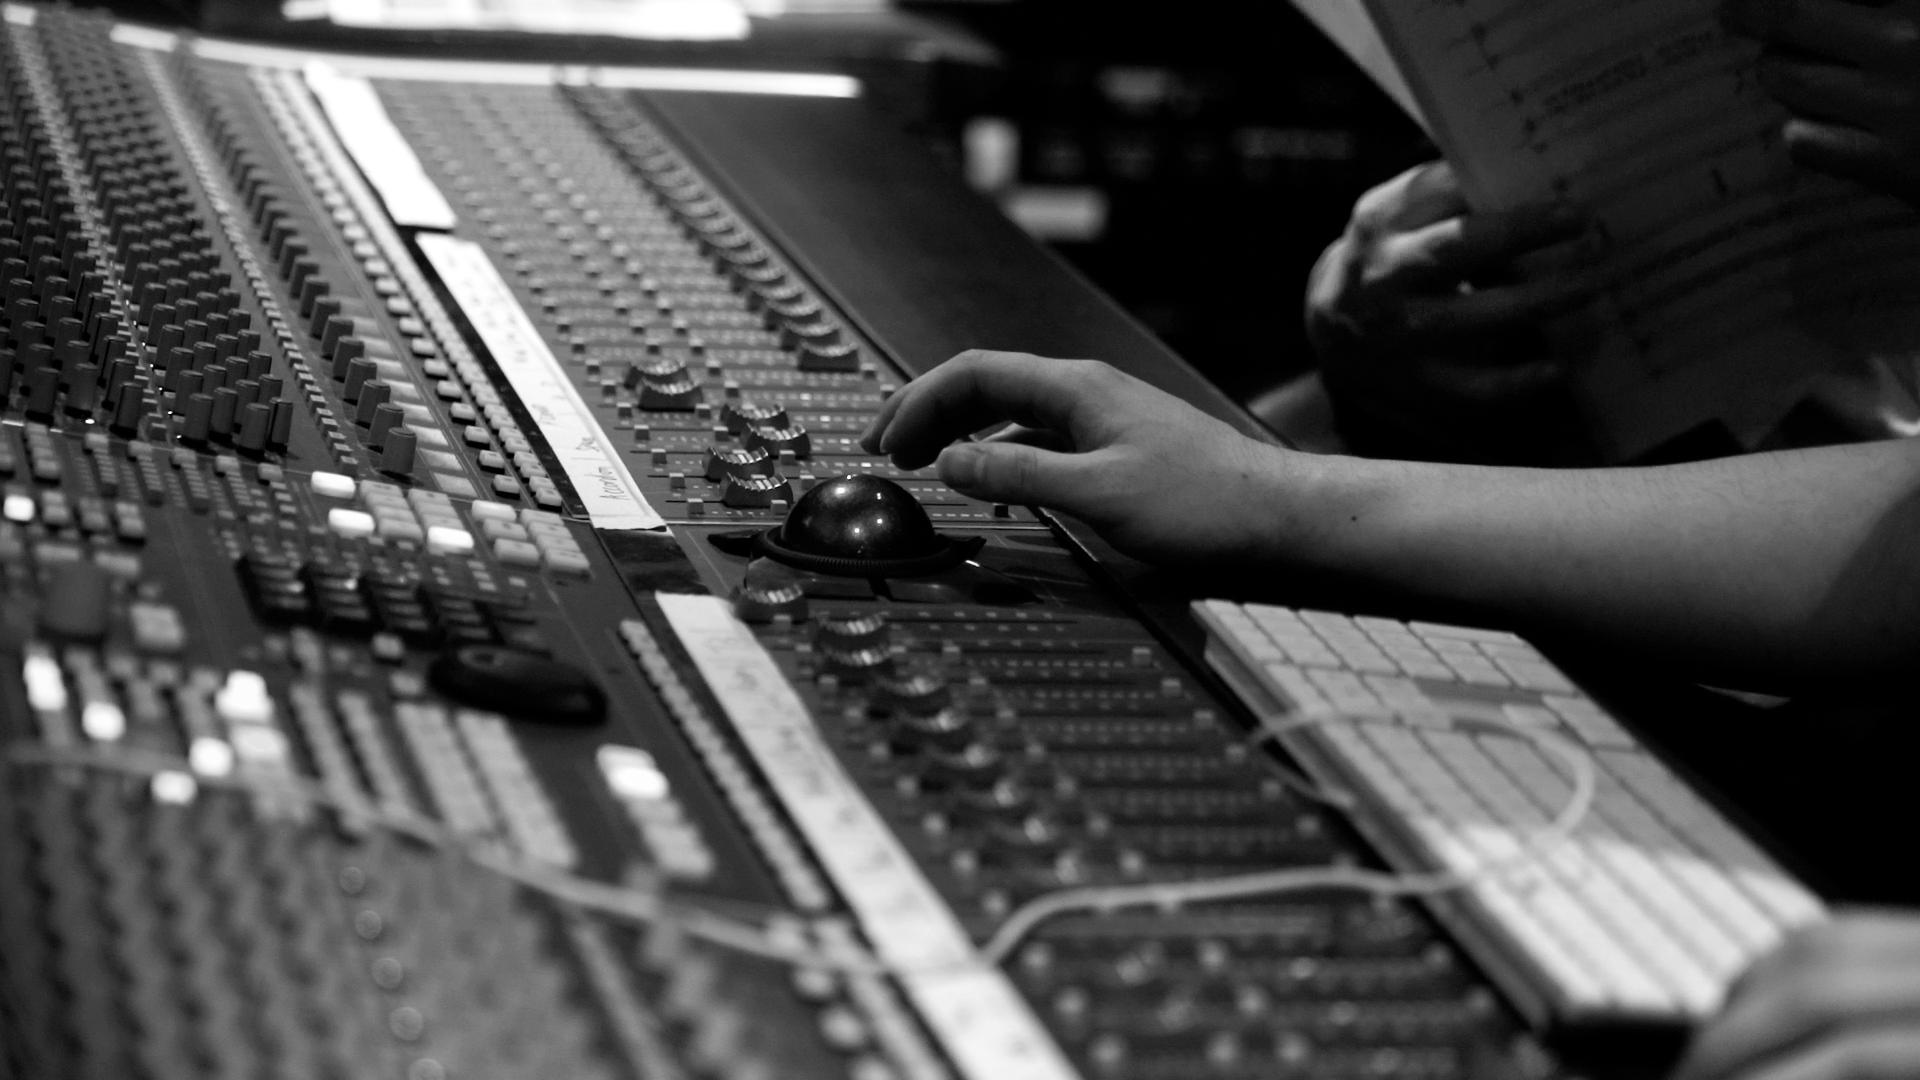 Copy of Recording board